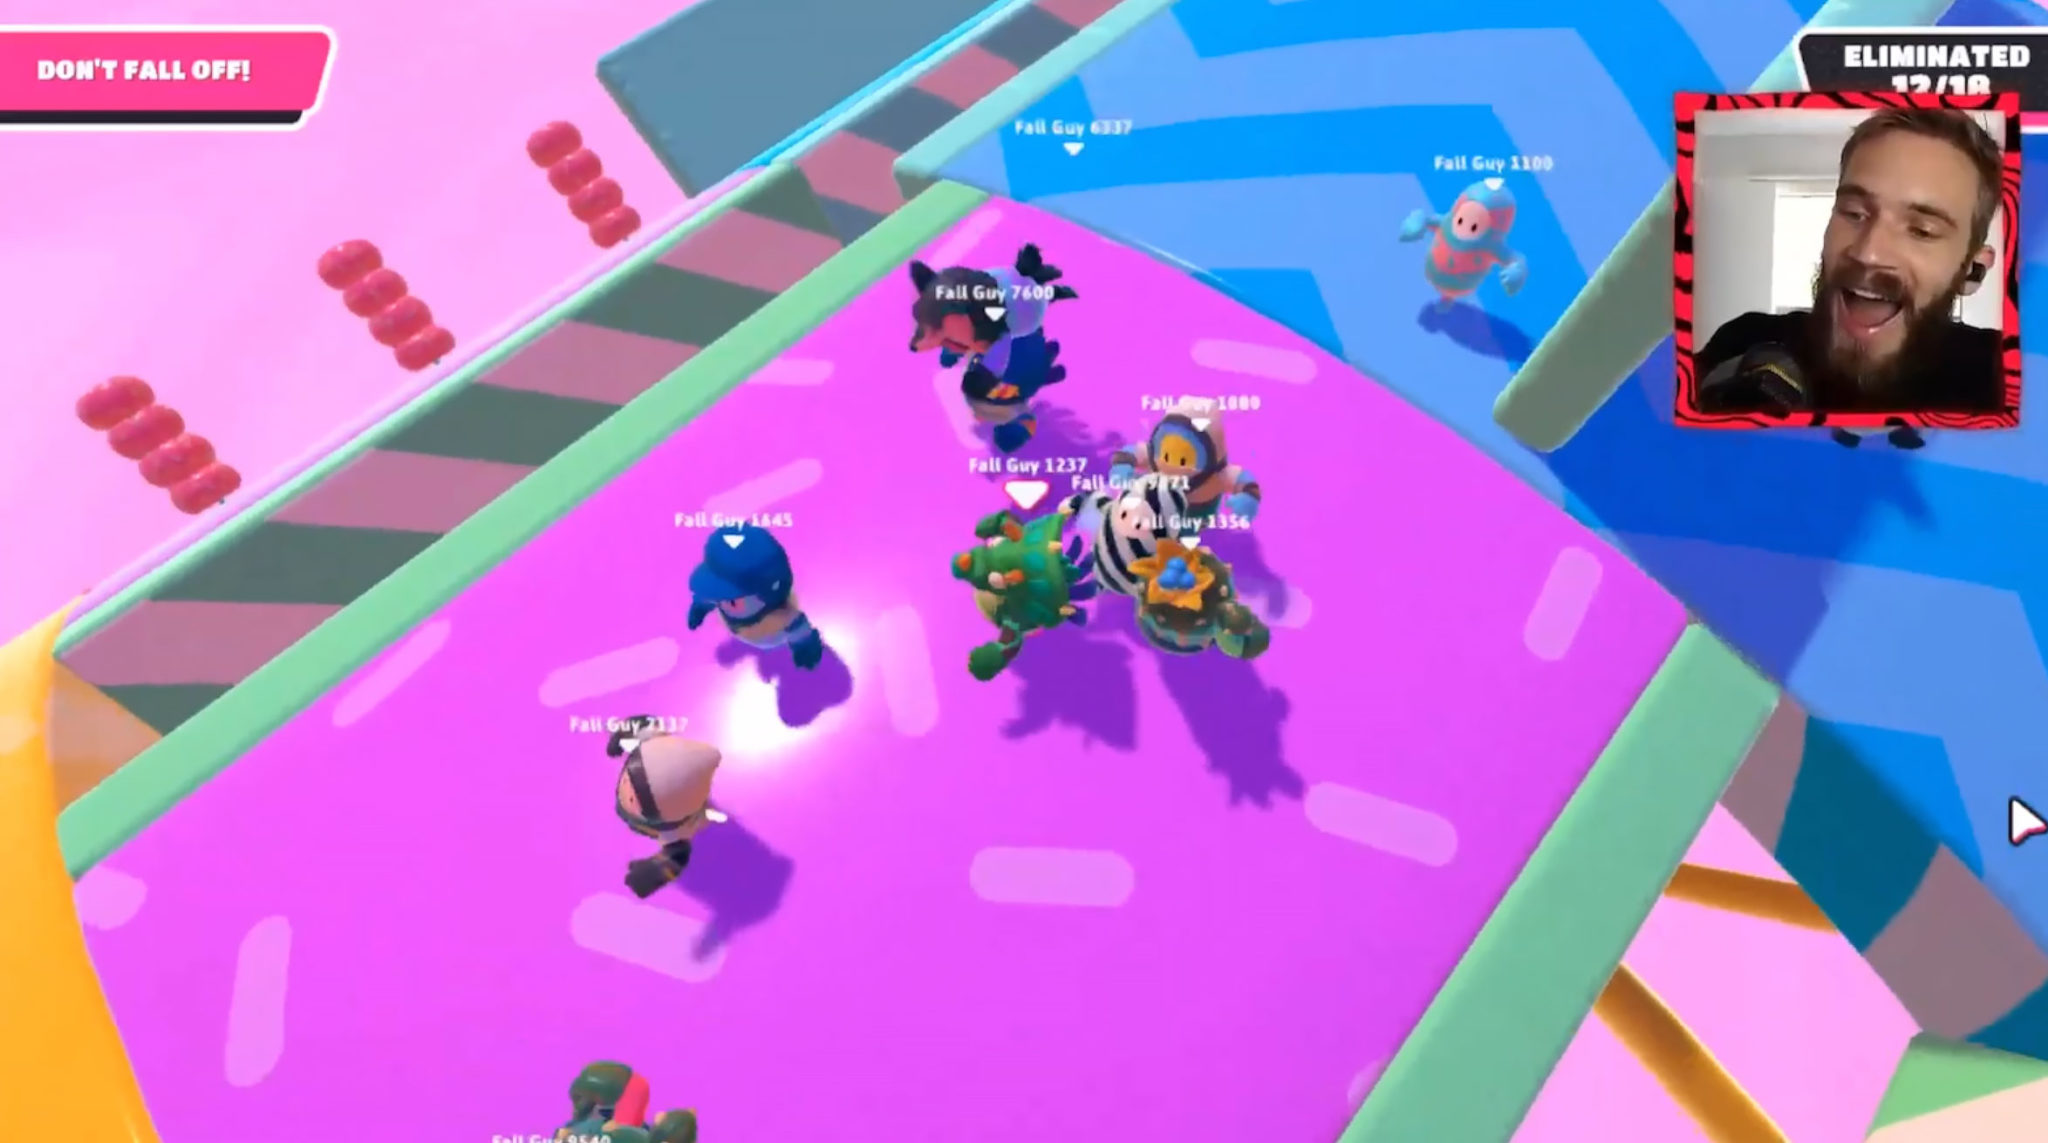 pewdiepie playing fall guys